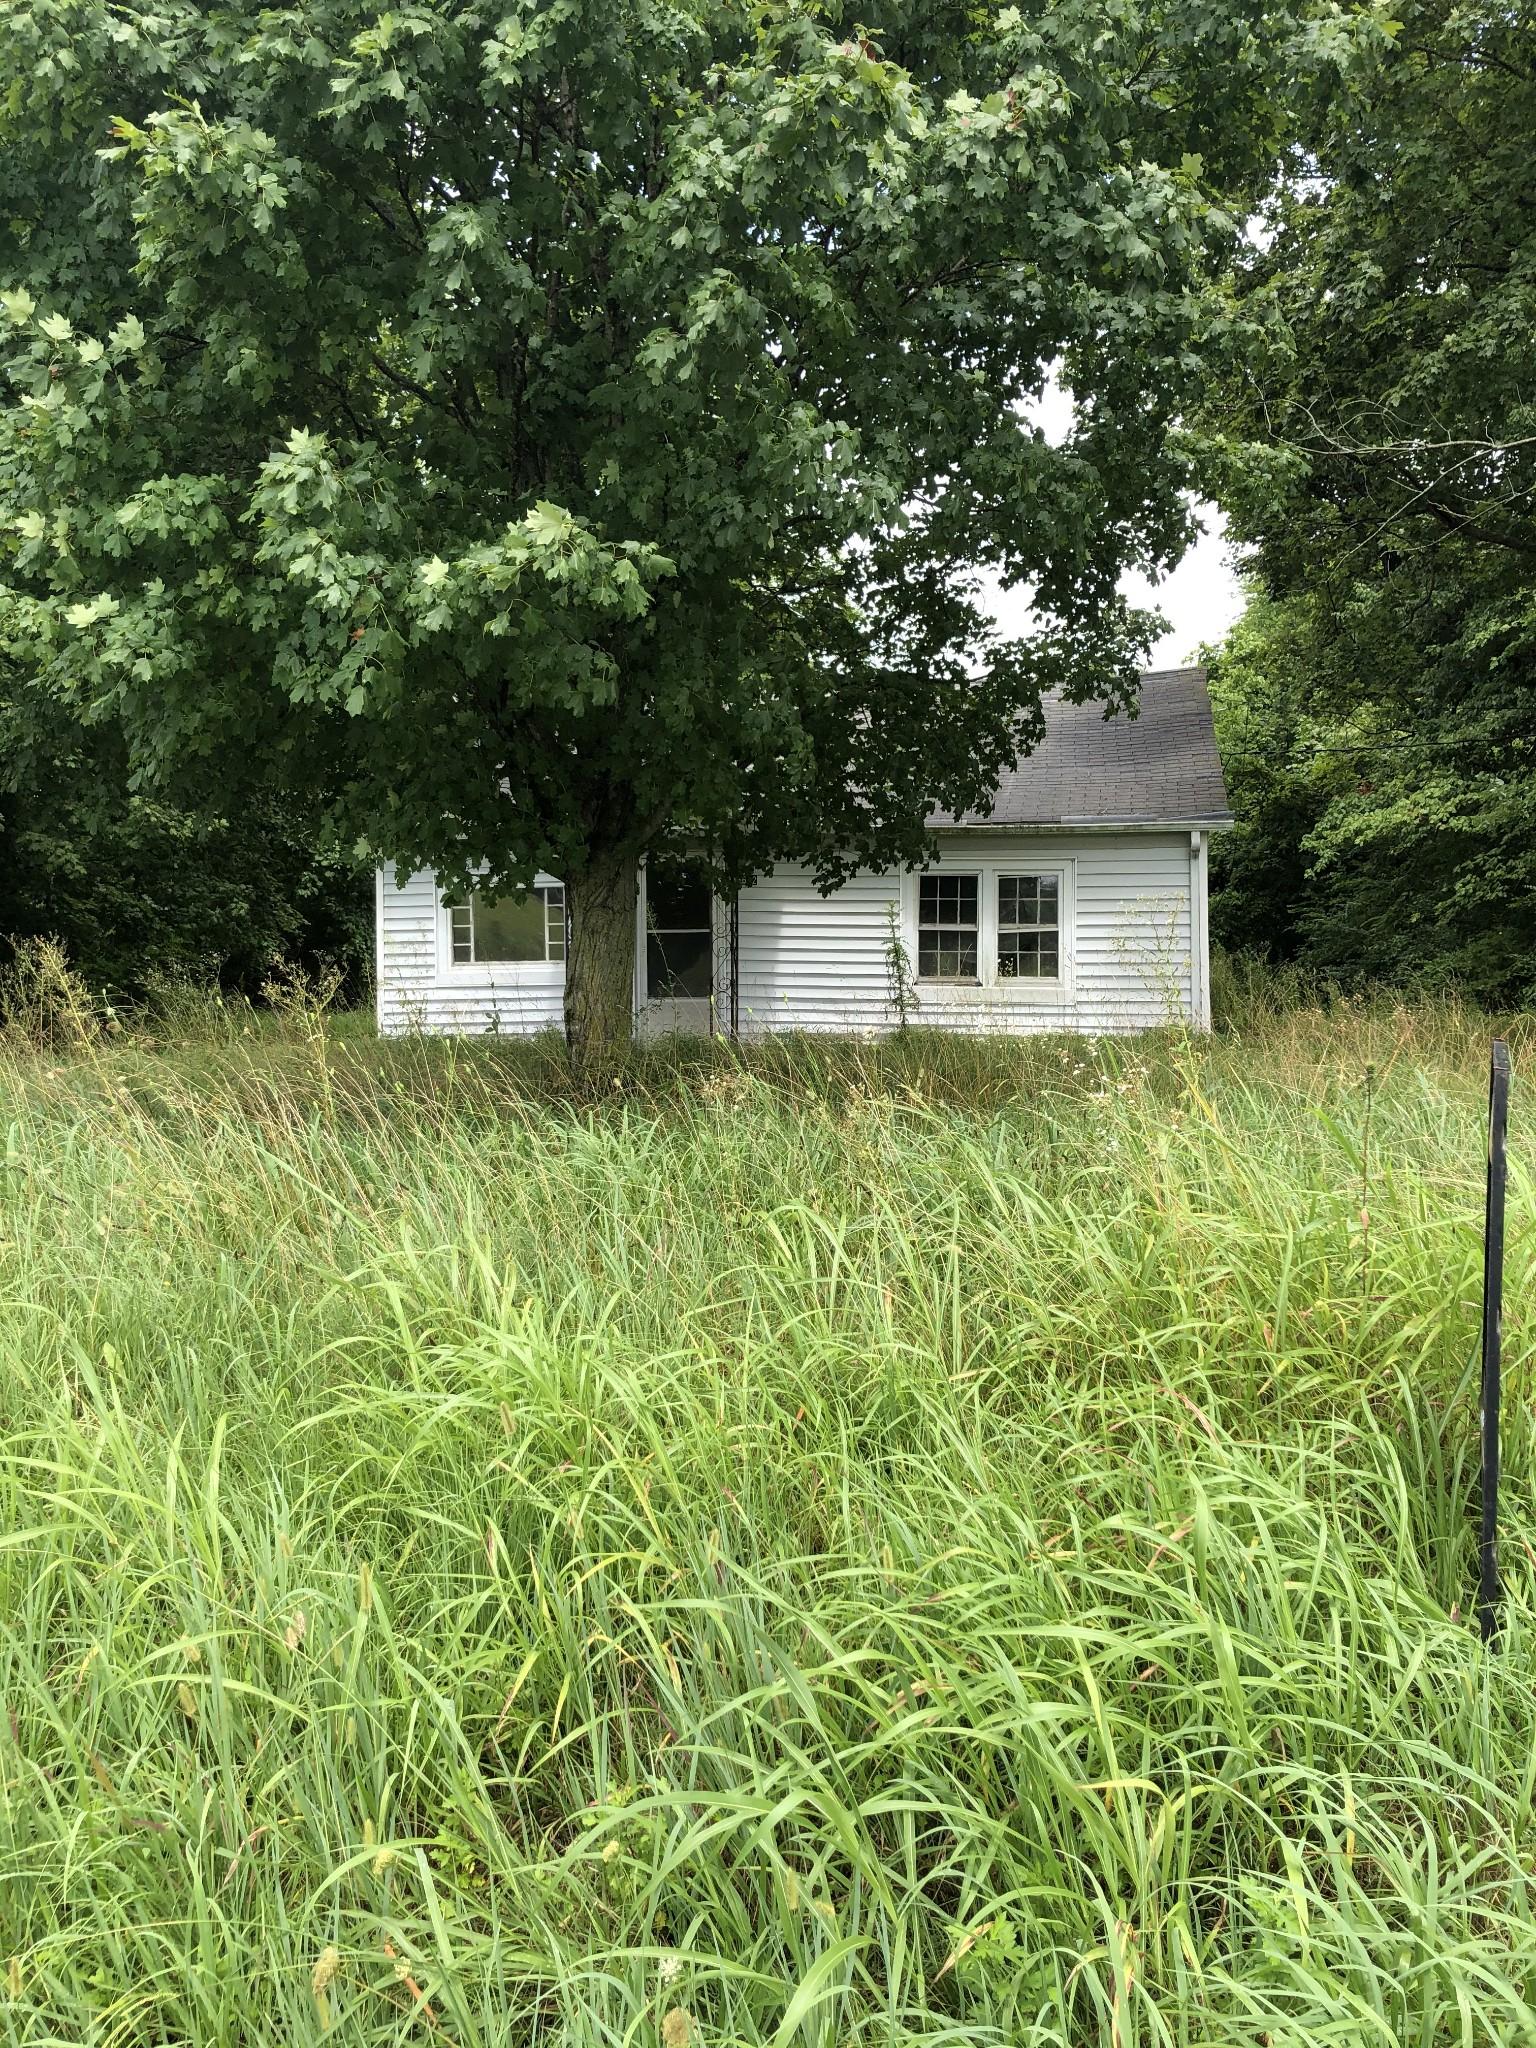 8612 Hwy 25 E Property Photo - Cross Plains, TN real estate listing